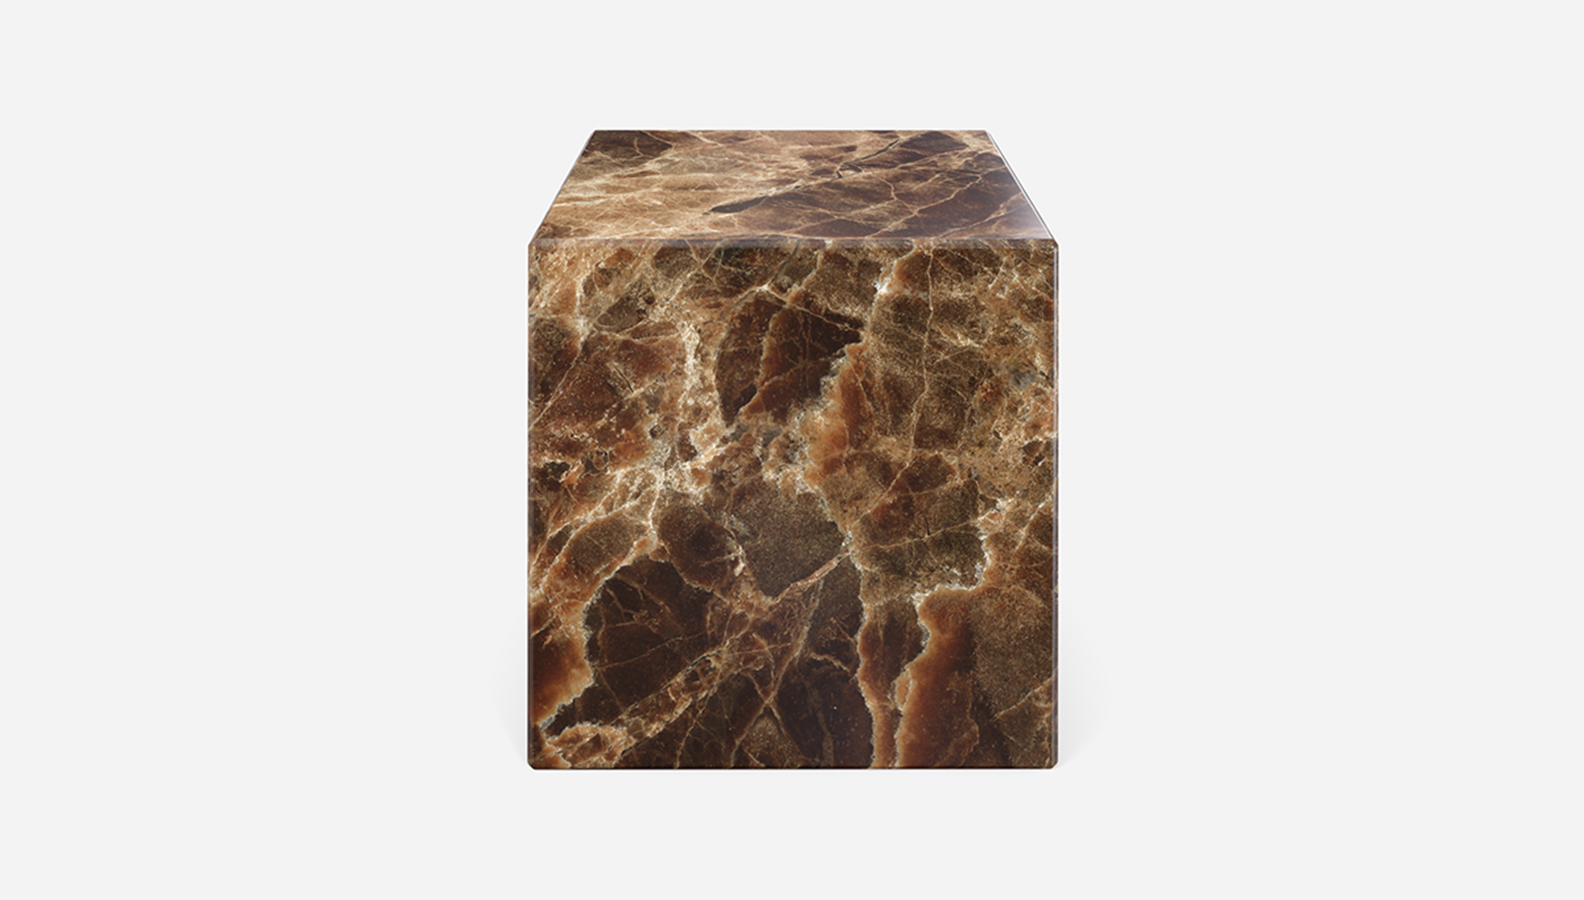 Aime Té Marmerblok Kubus - Dark Emperador Bruin - 40  x 40  x 40